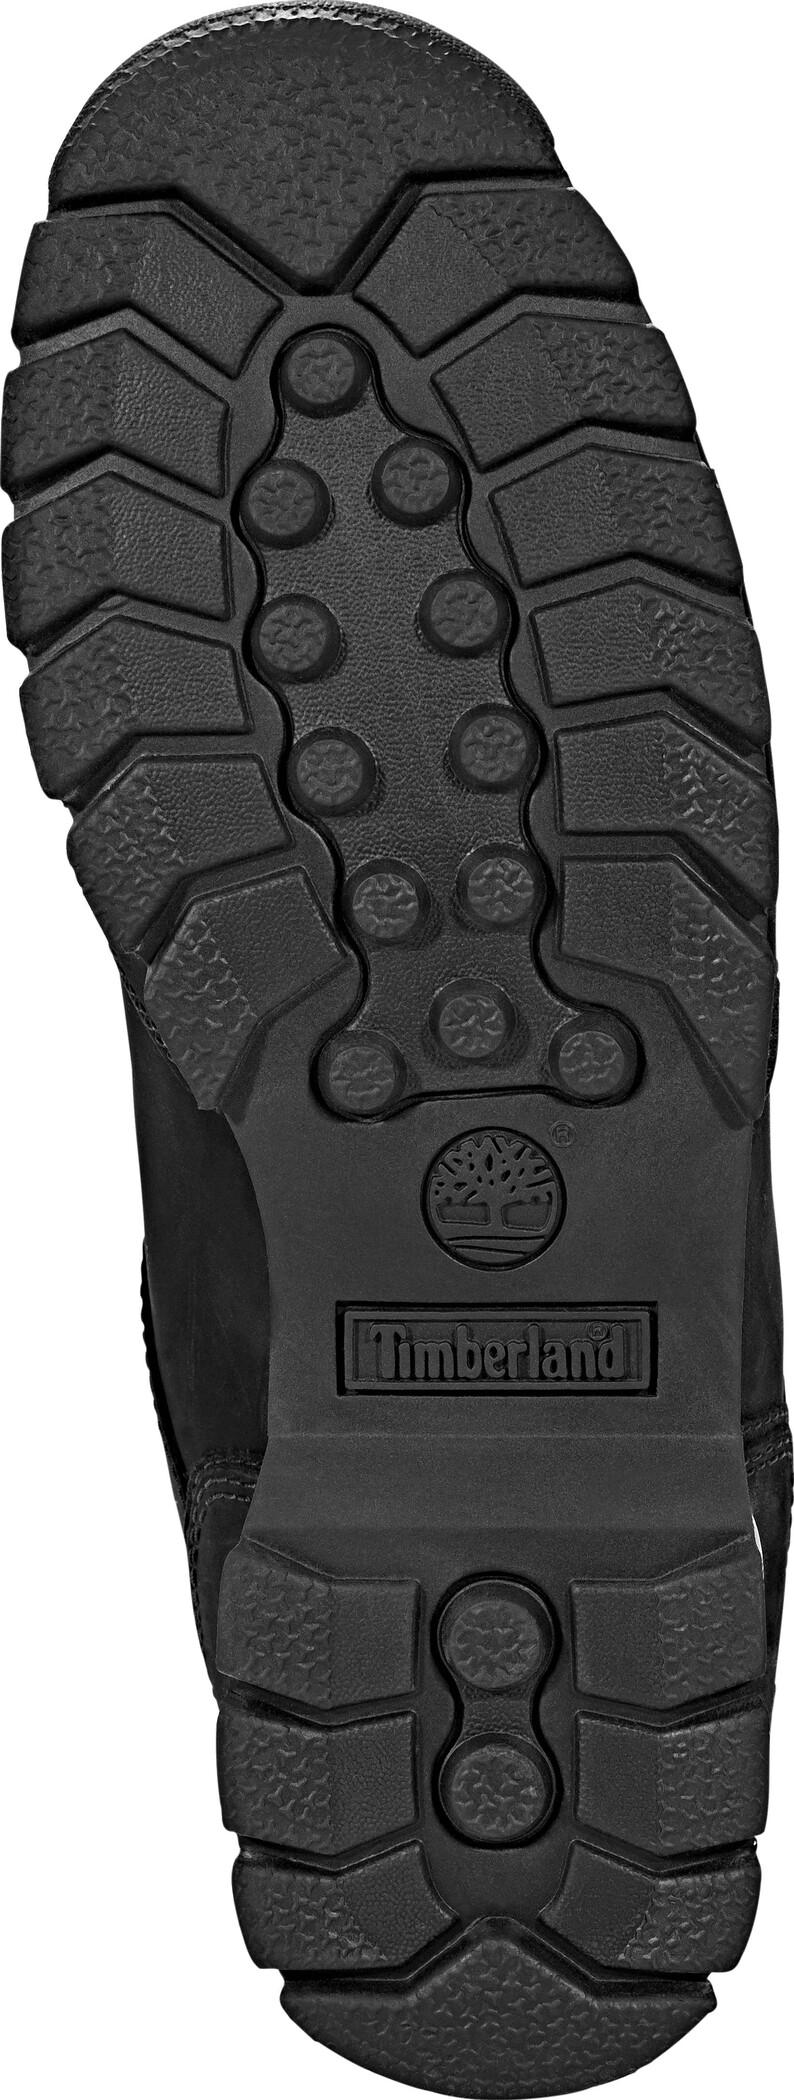 Timberland Splitrock 2 Wanderschuhe Herren black nubuk